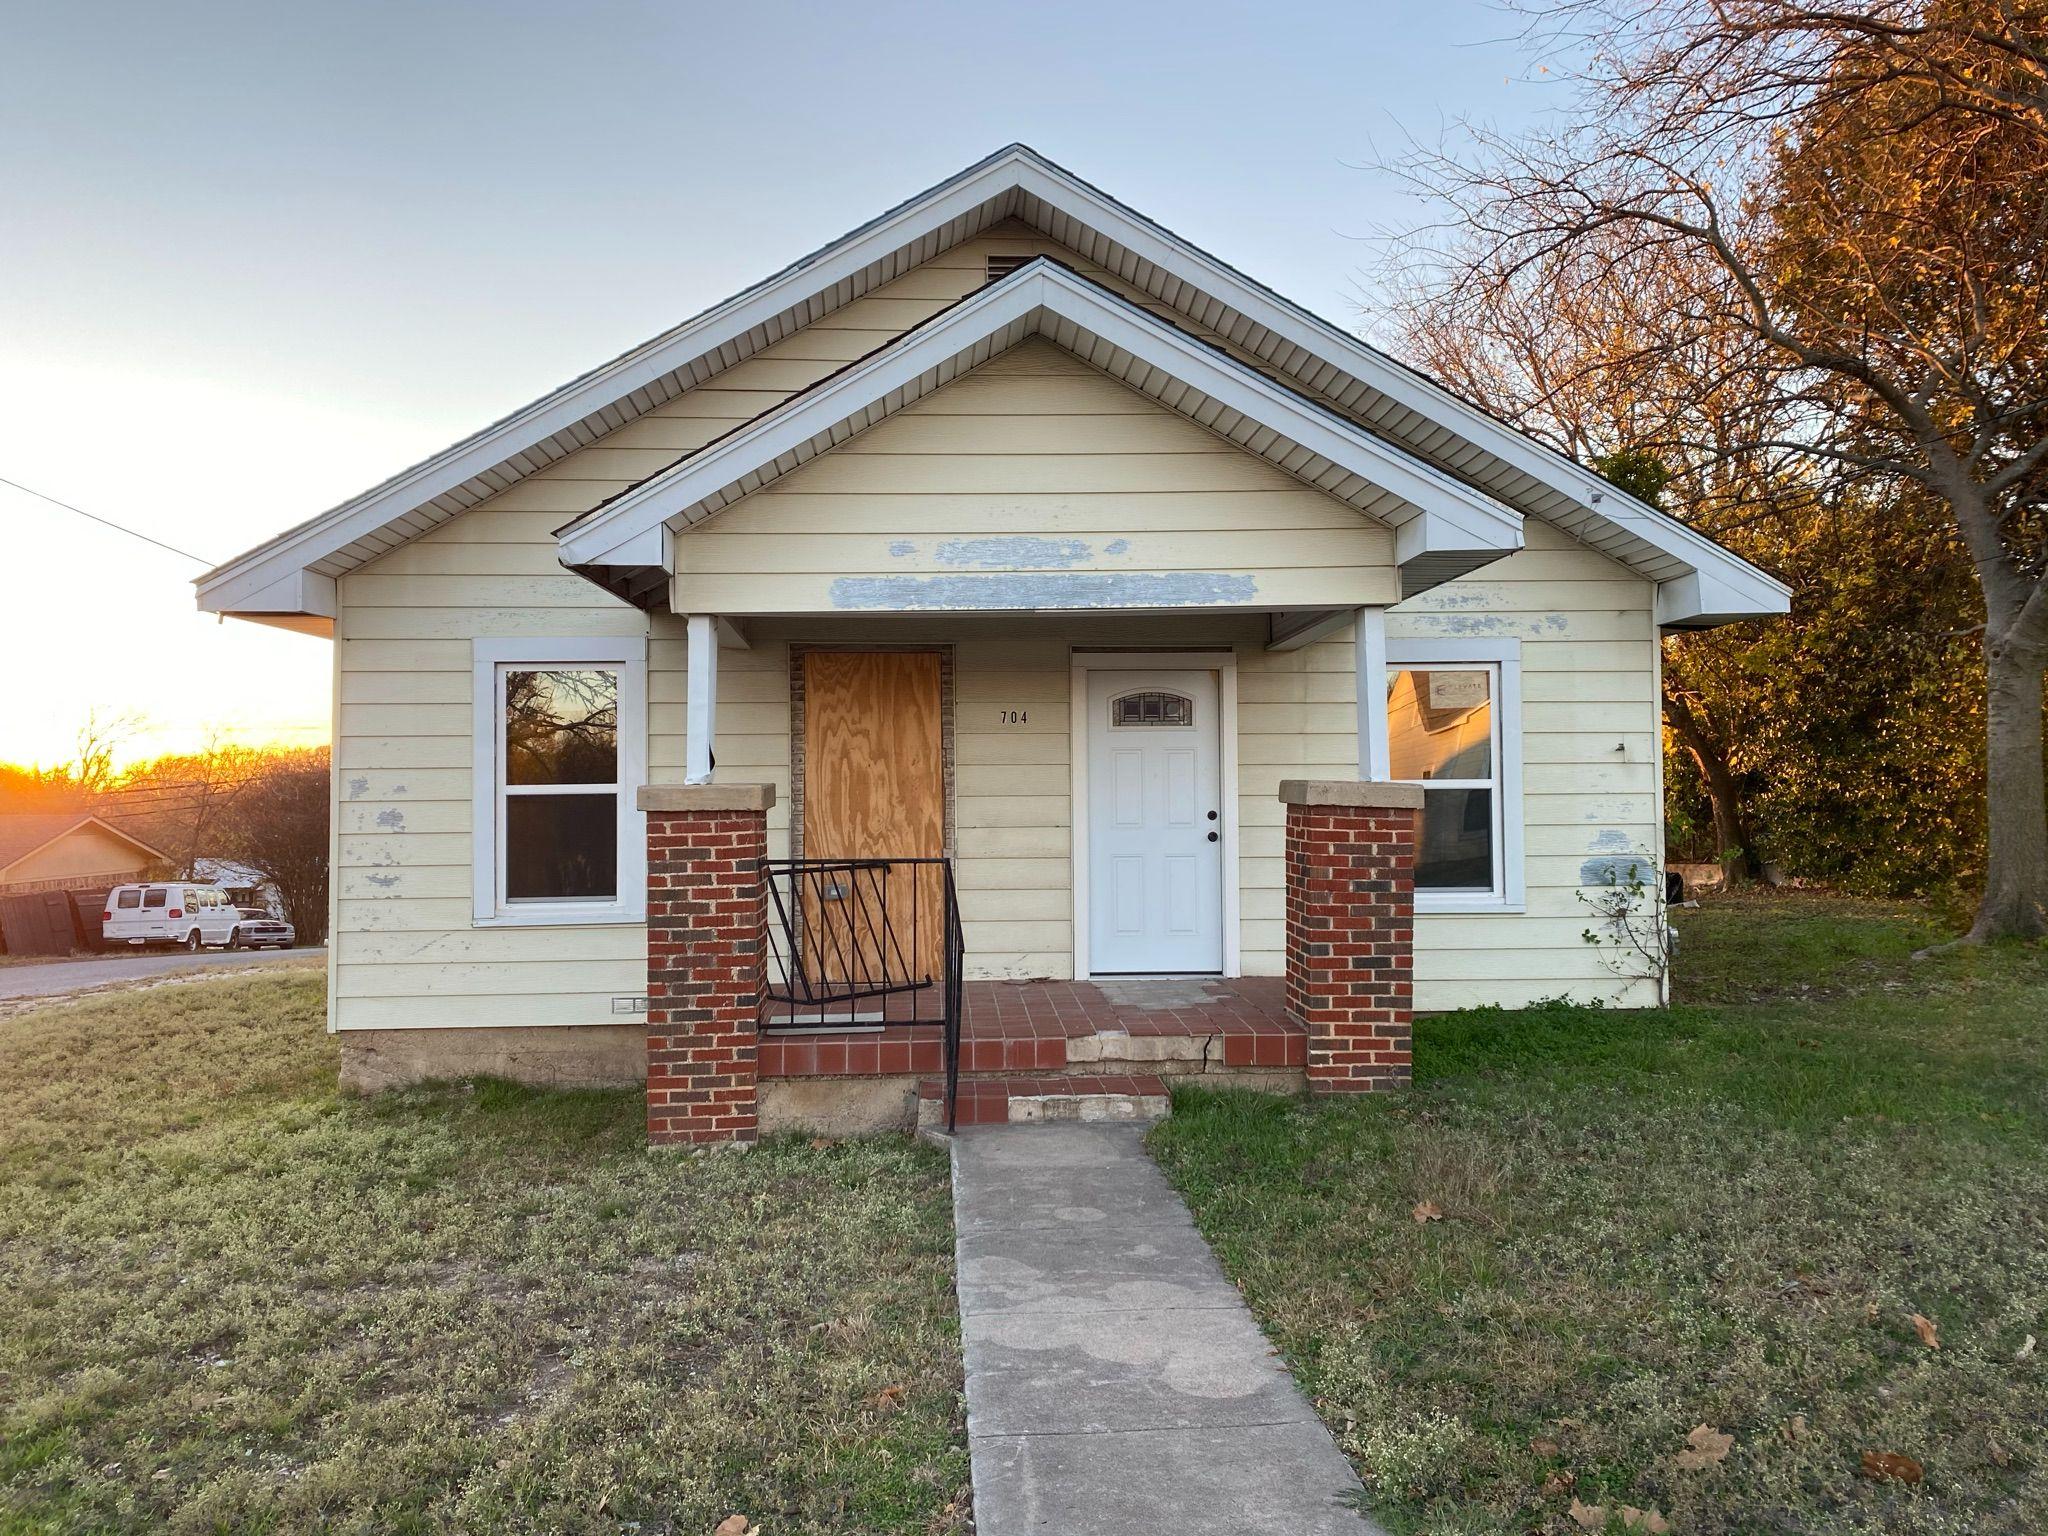 704 S Trinity St, Decatur, TX